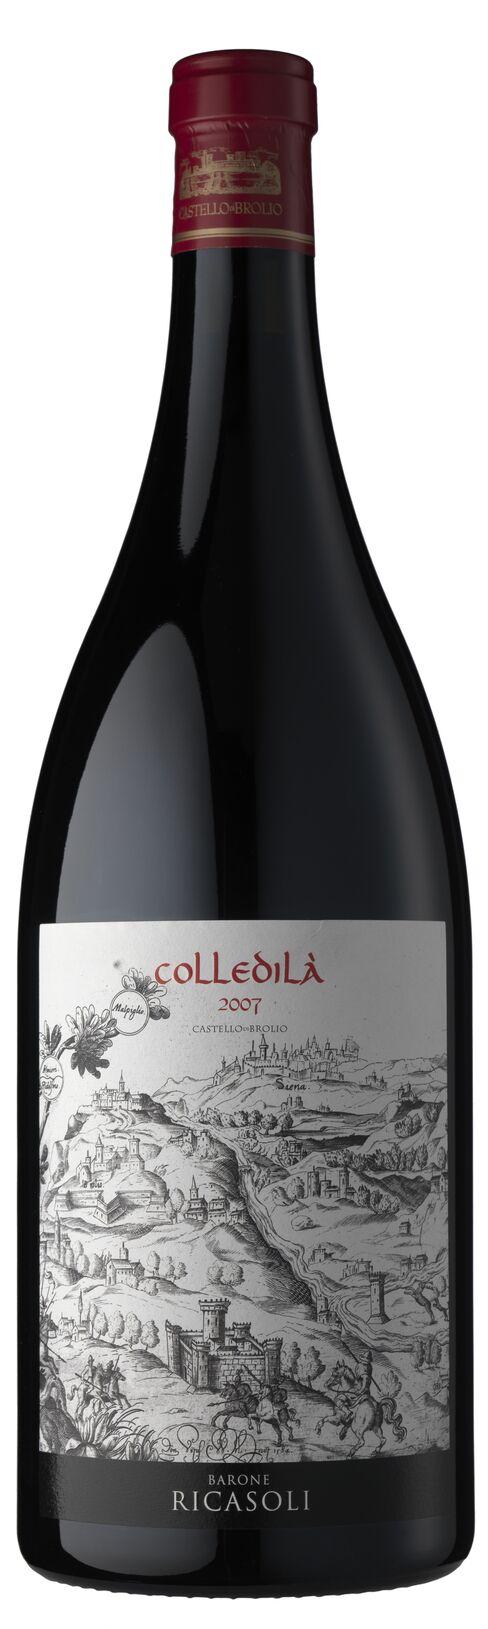 Ricasoli's Colledila